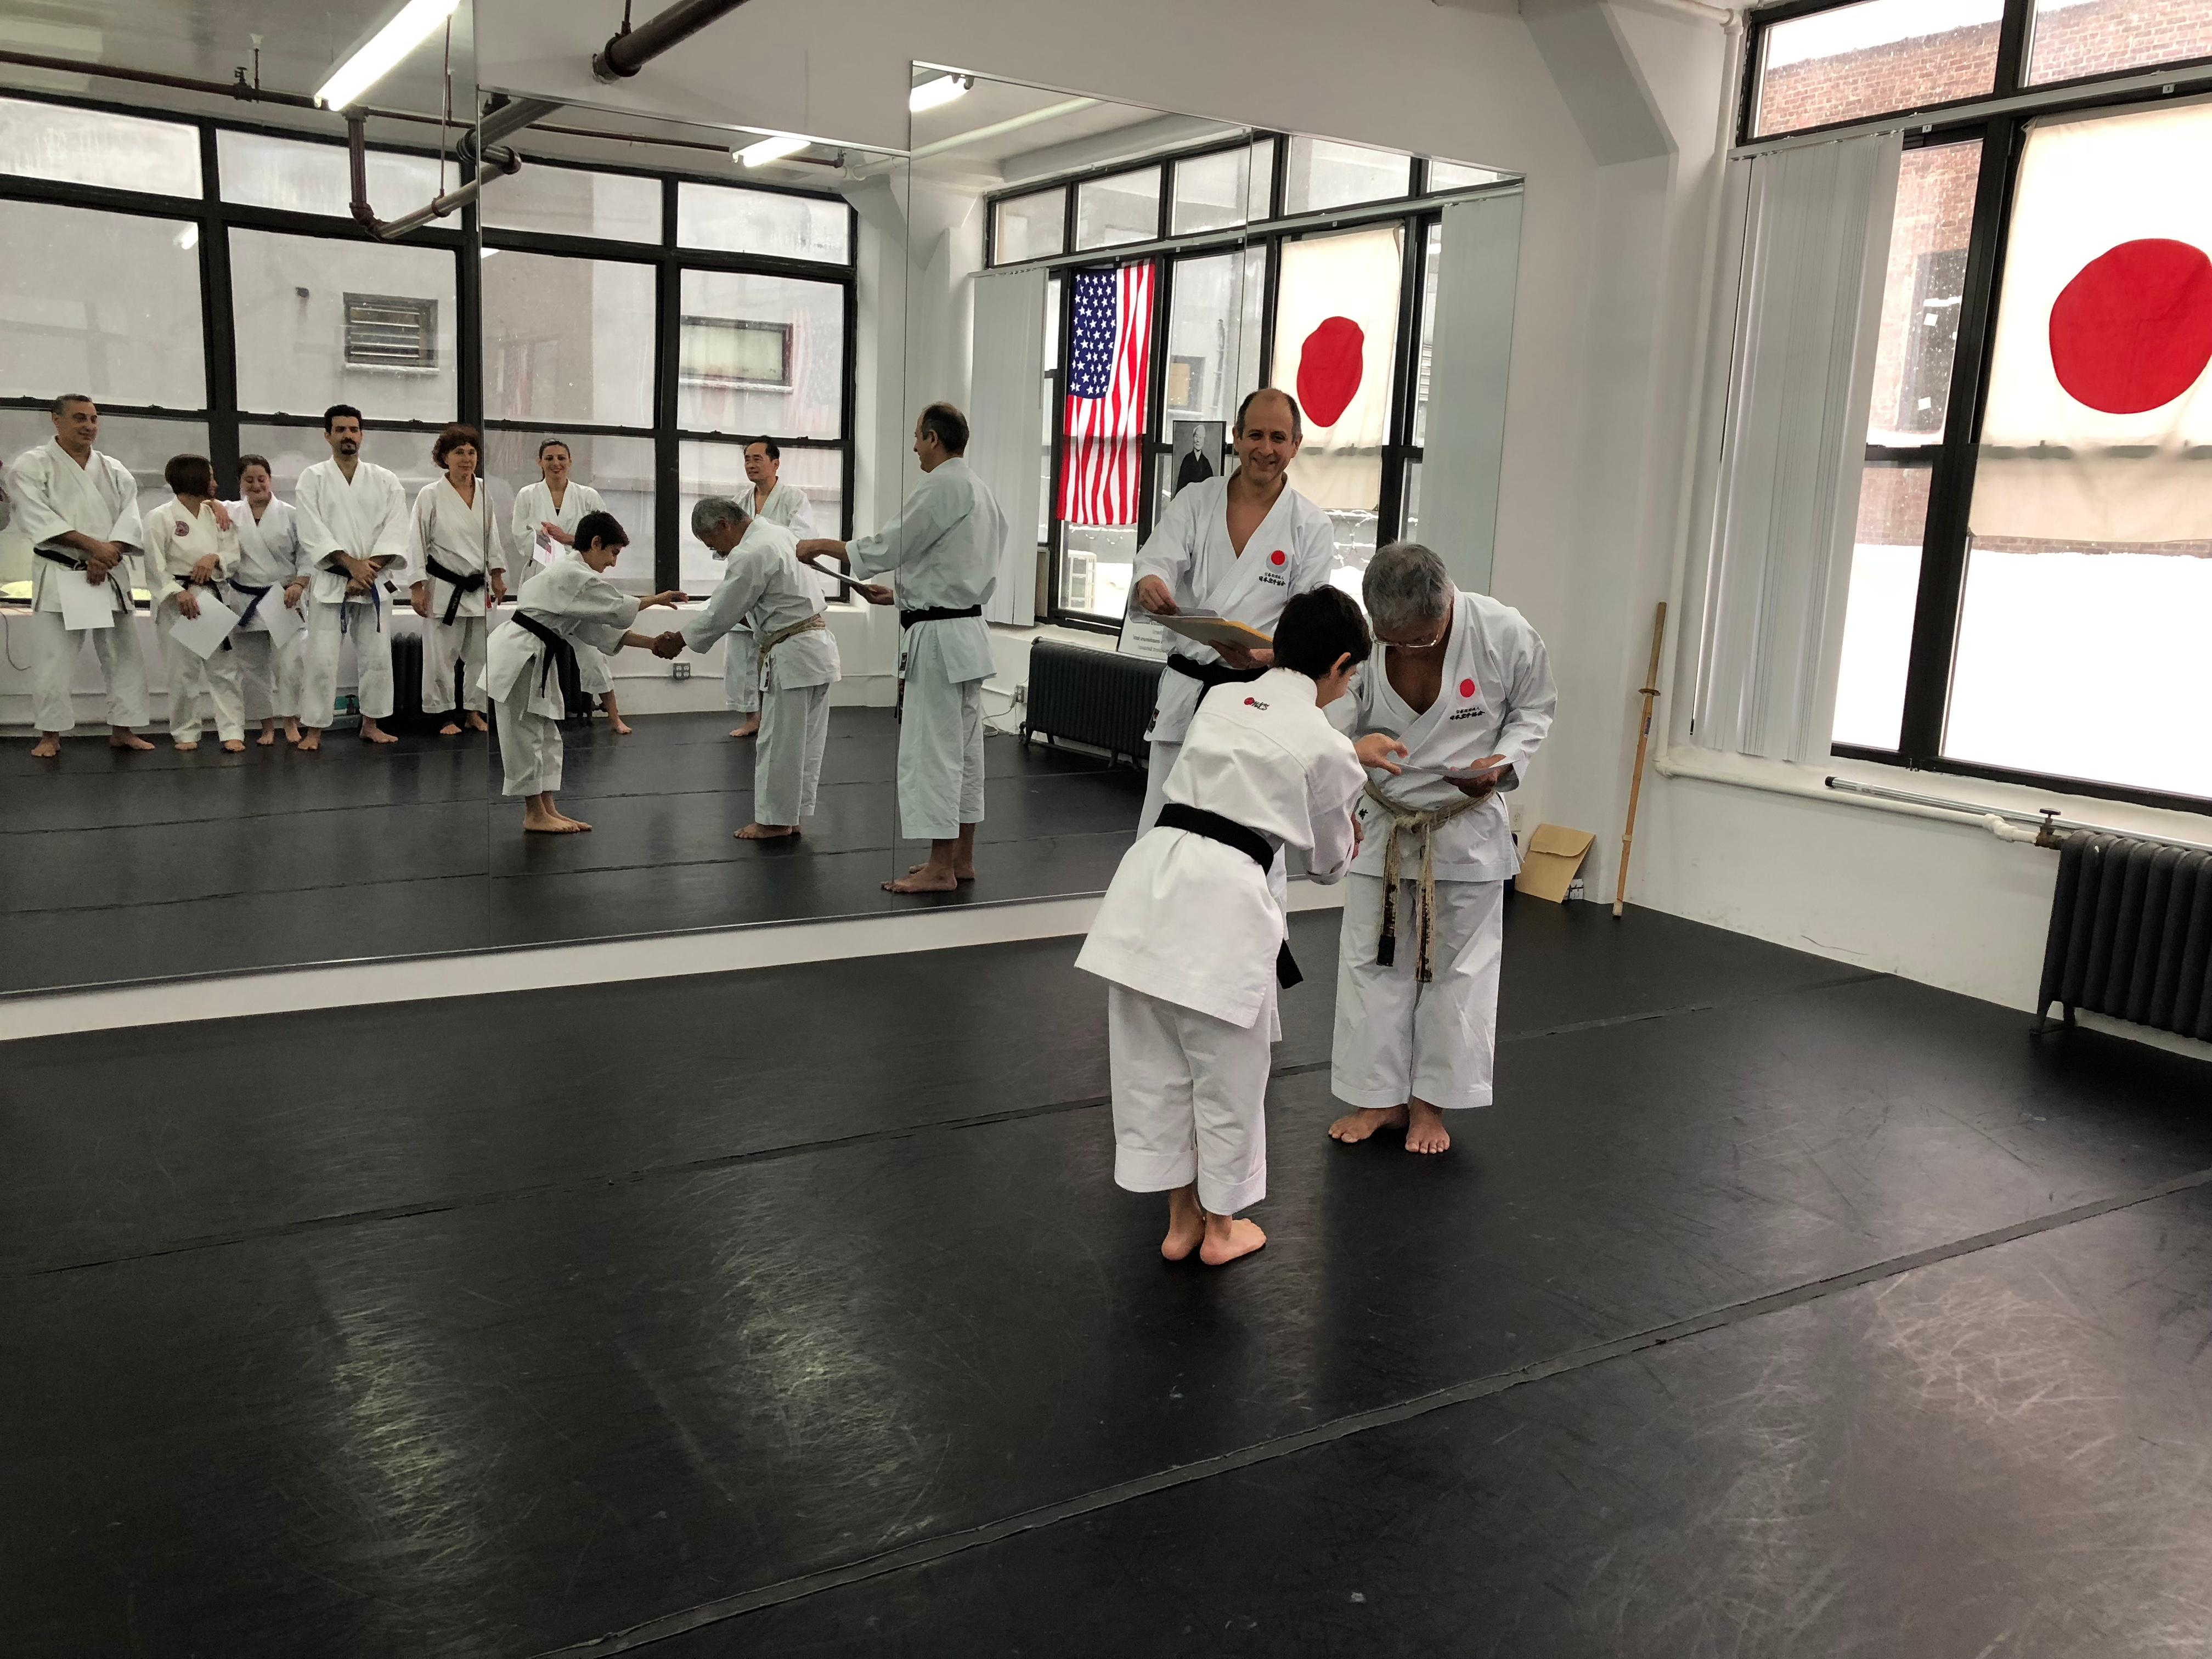 Shotokan Karate Studio LLC